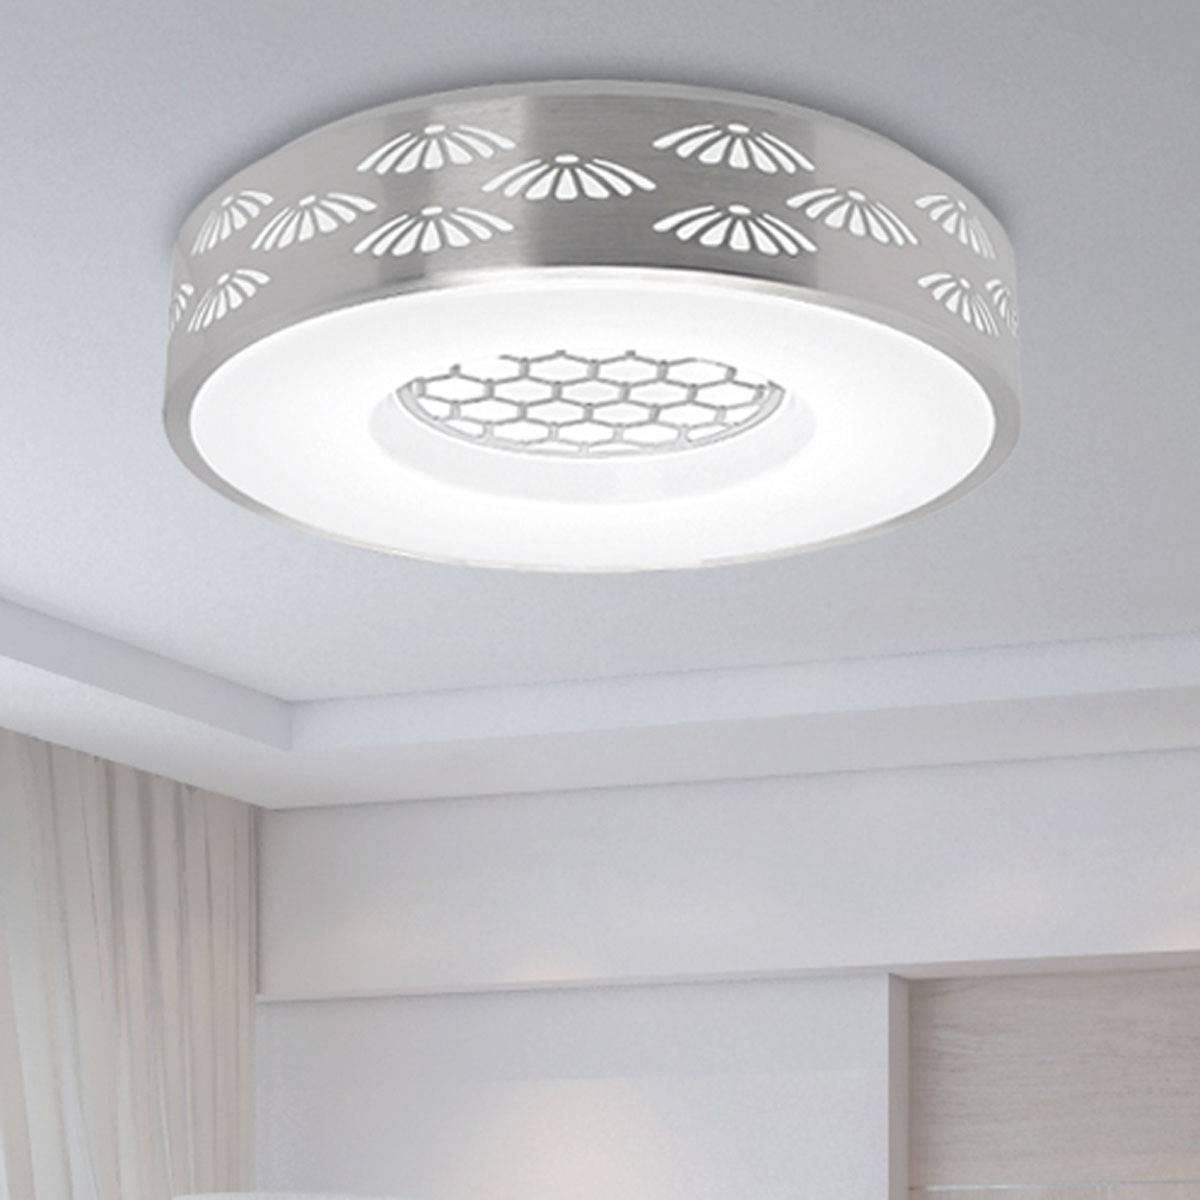 new style12W led livingroom ceiling light modern lamps for home decoration AC180-265V led hallway li